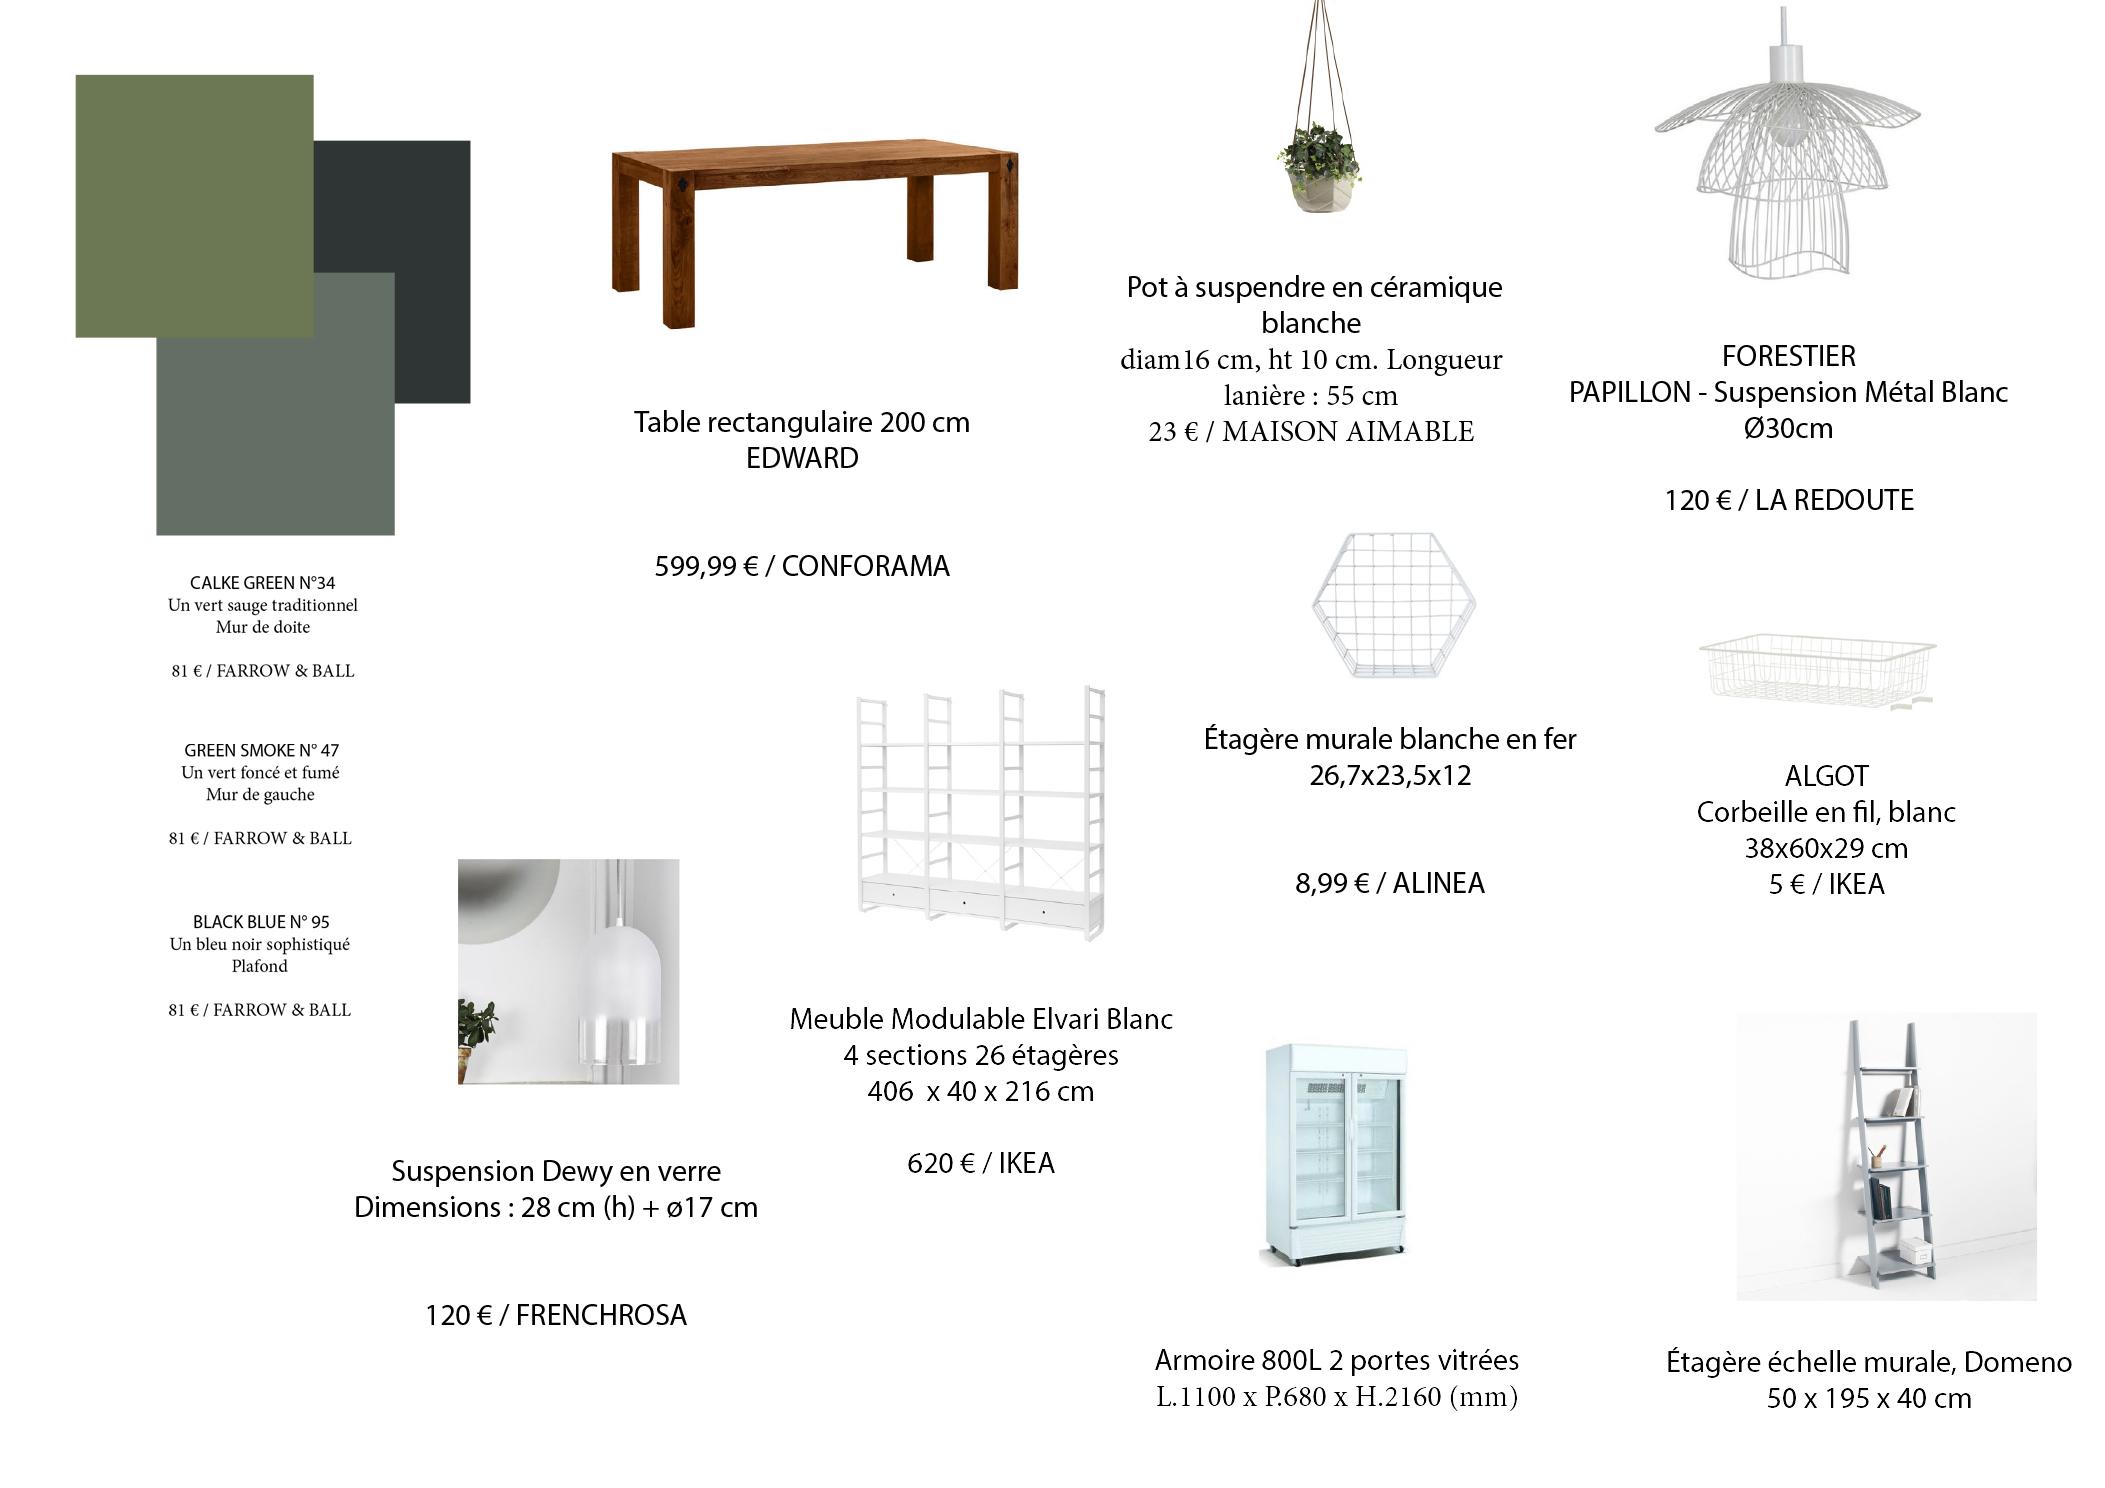 shoppinglist